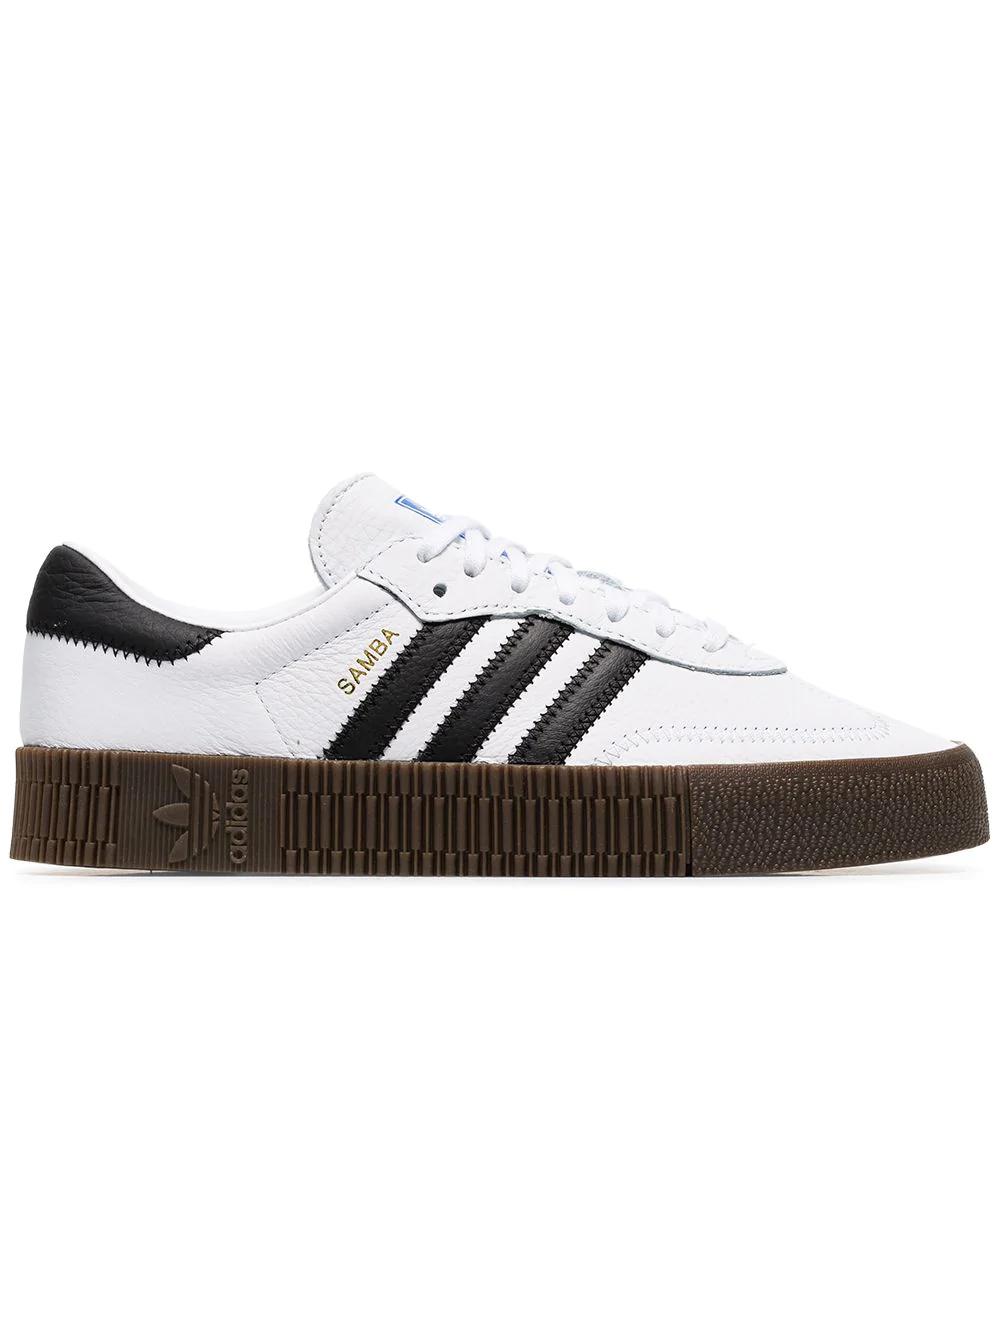 d4ab7932068319 Adidas Originals Adidas White Sambarose Leather Sneakers